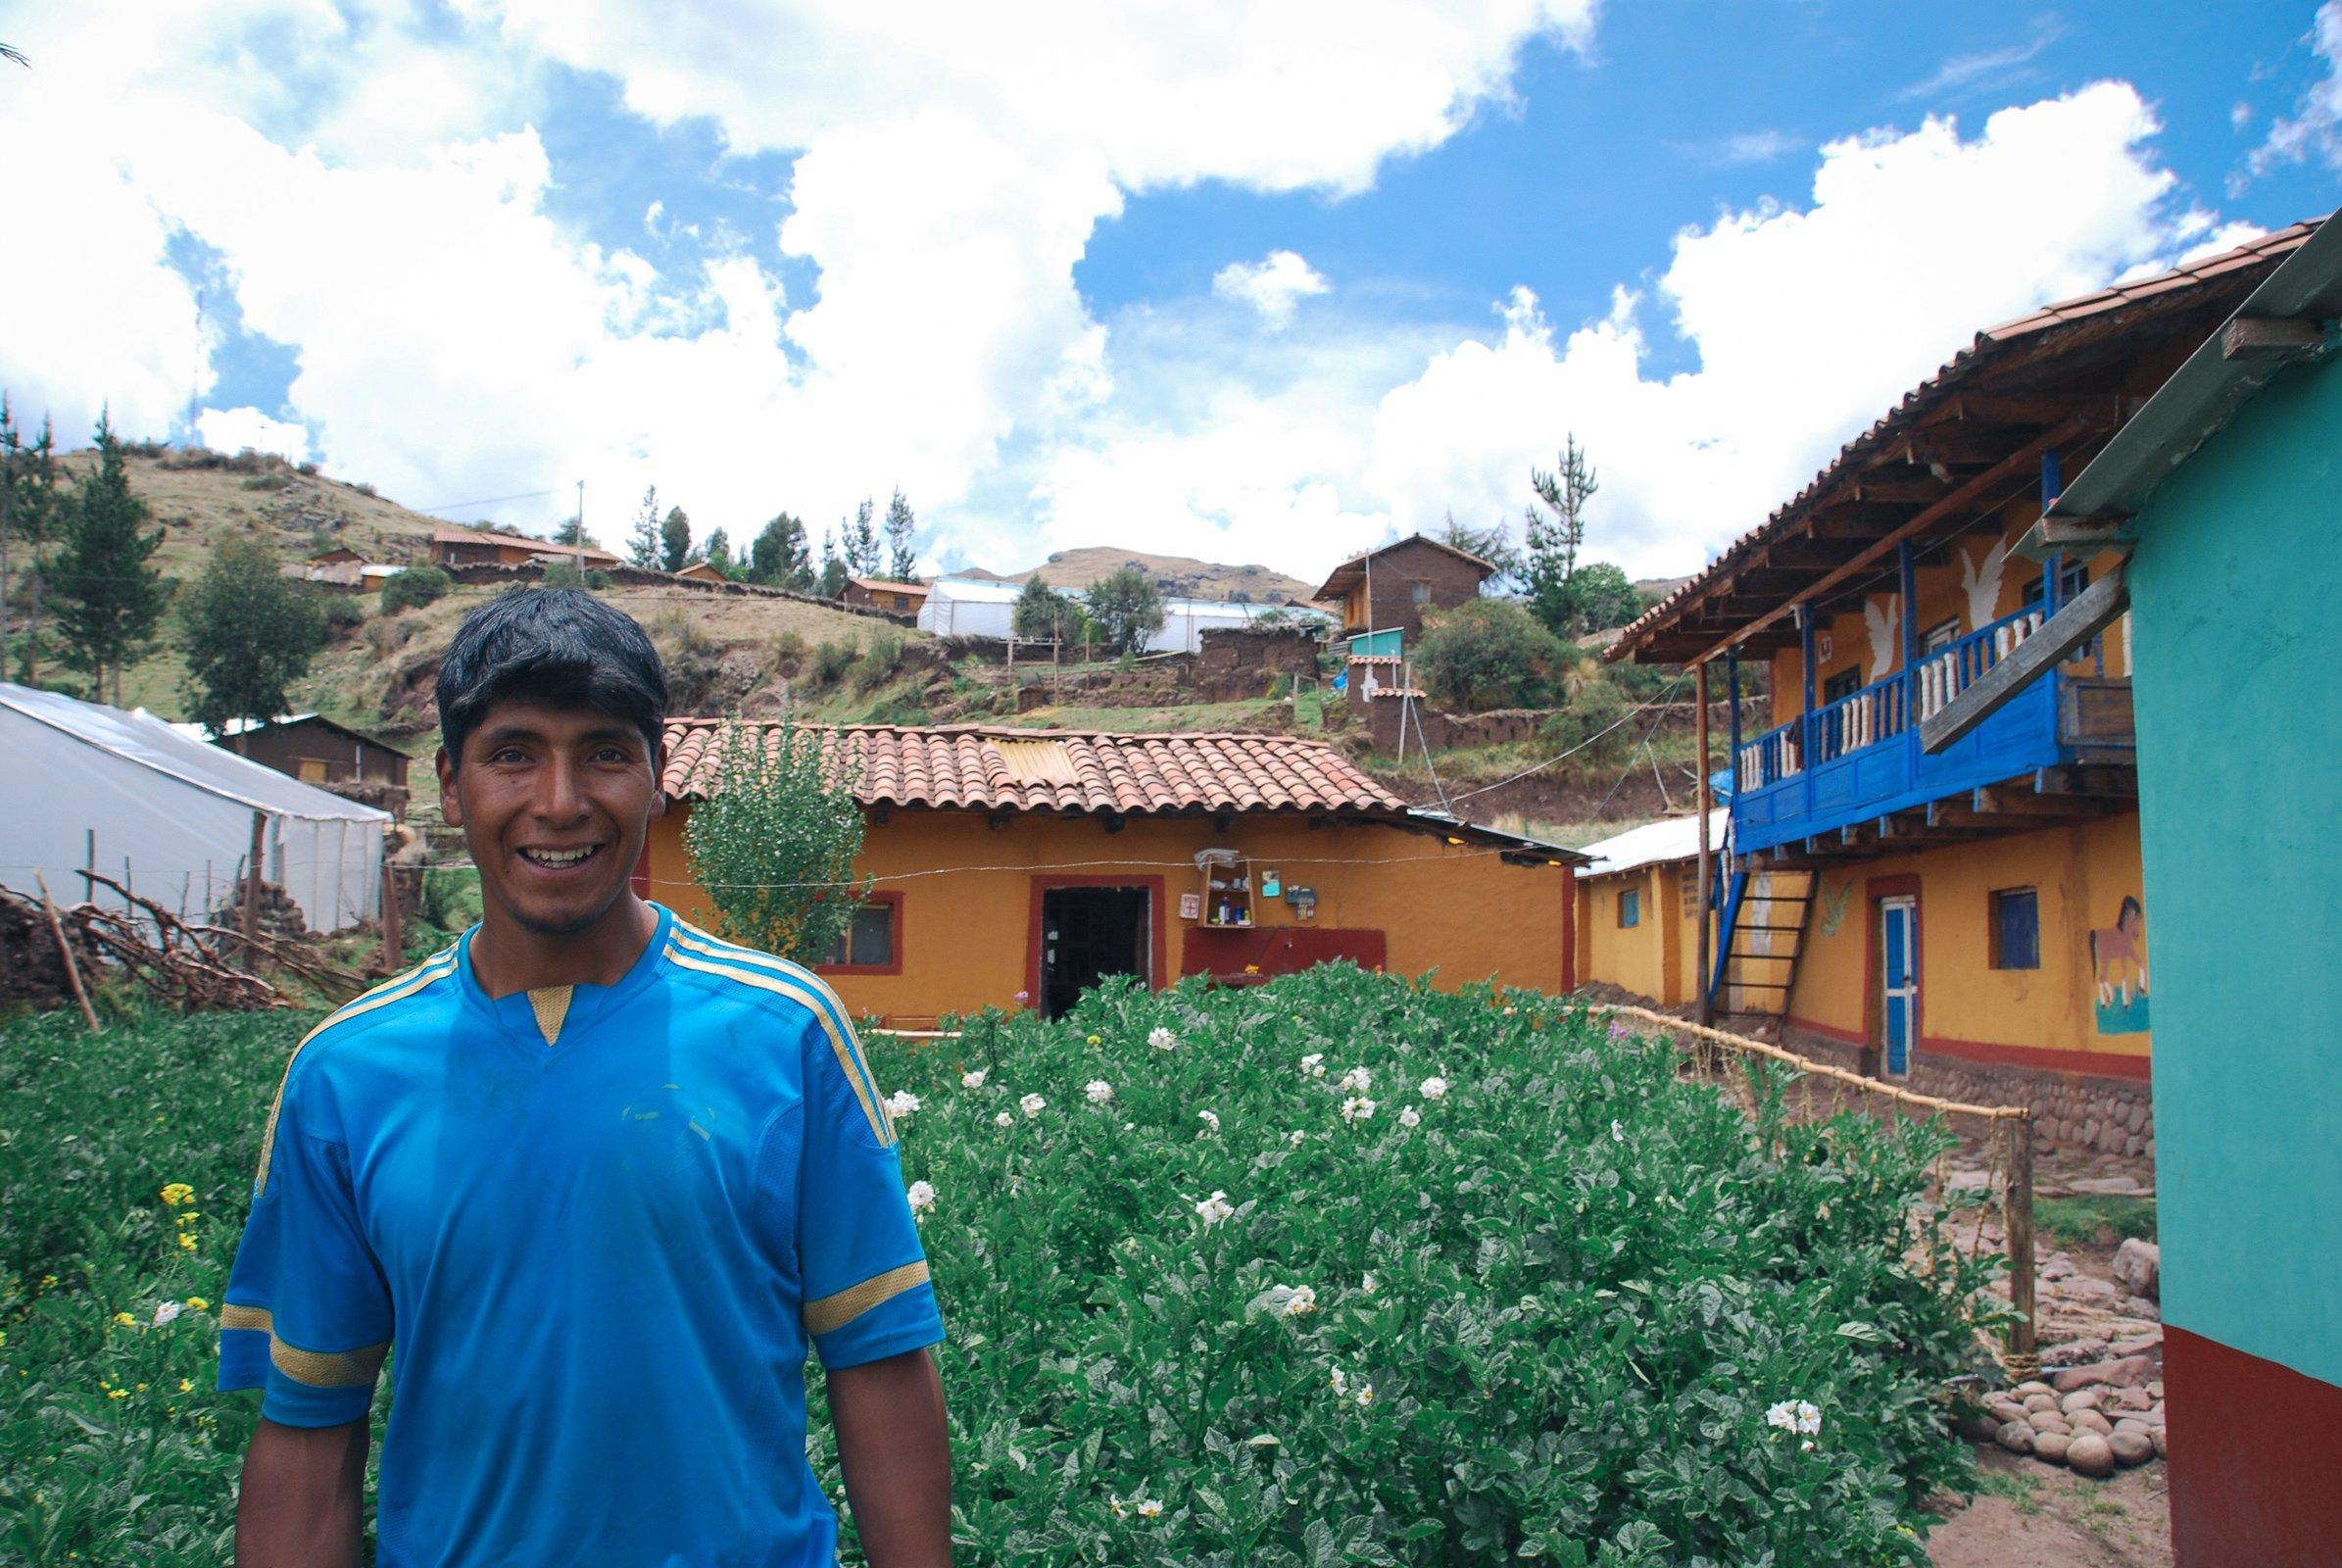 Orgullo quechua 5